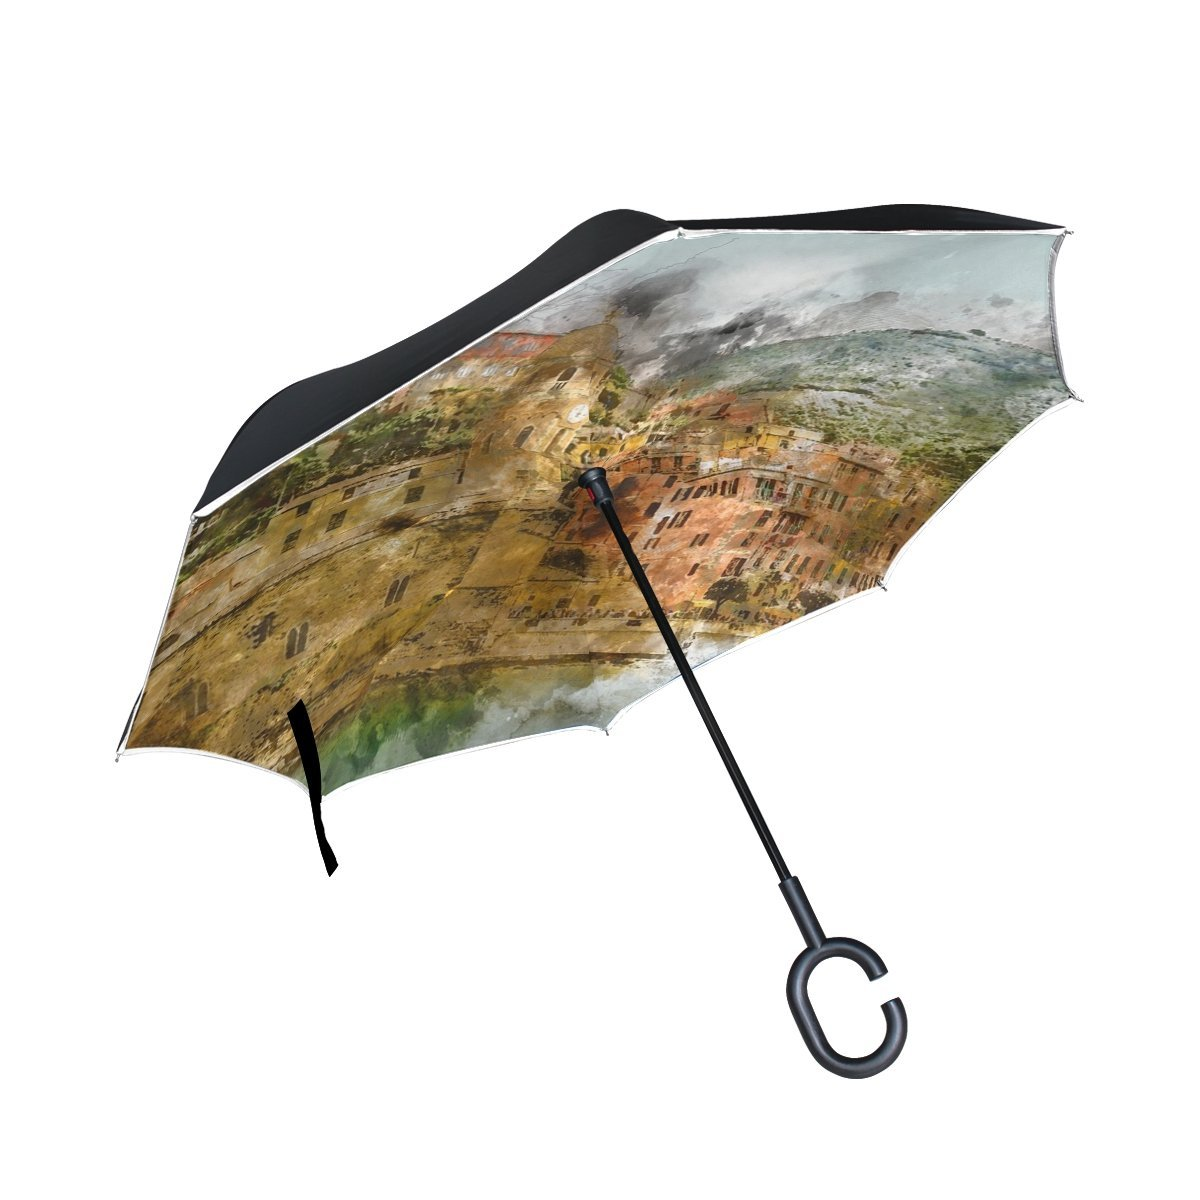 Double Layer Inverted Cinque Terre Italy Beach Amalfi Coast Buildings Umbrellas Reverse Folding Umbrella Windproof Uv Protection Big Straight Umbrella For Car Rain Outdoor With C-shaped Handle